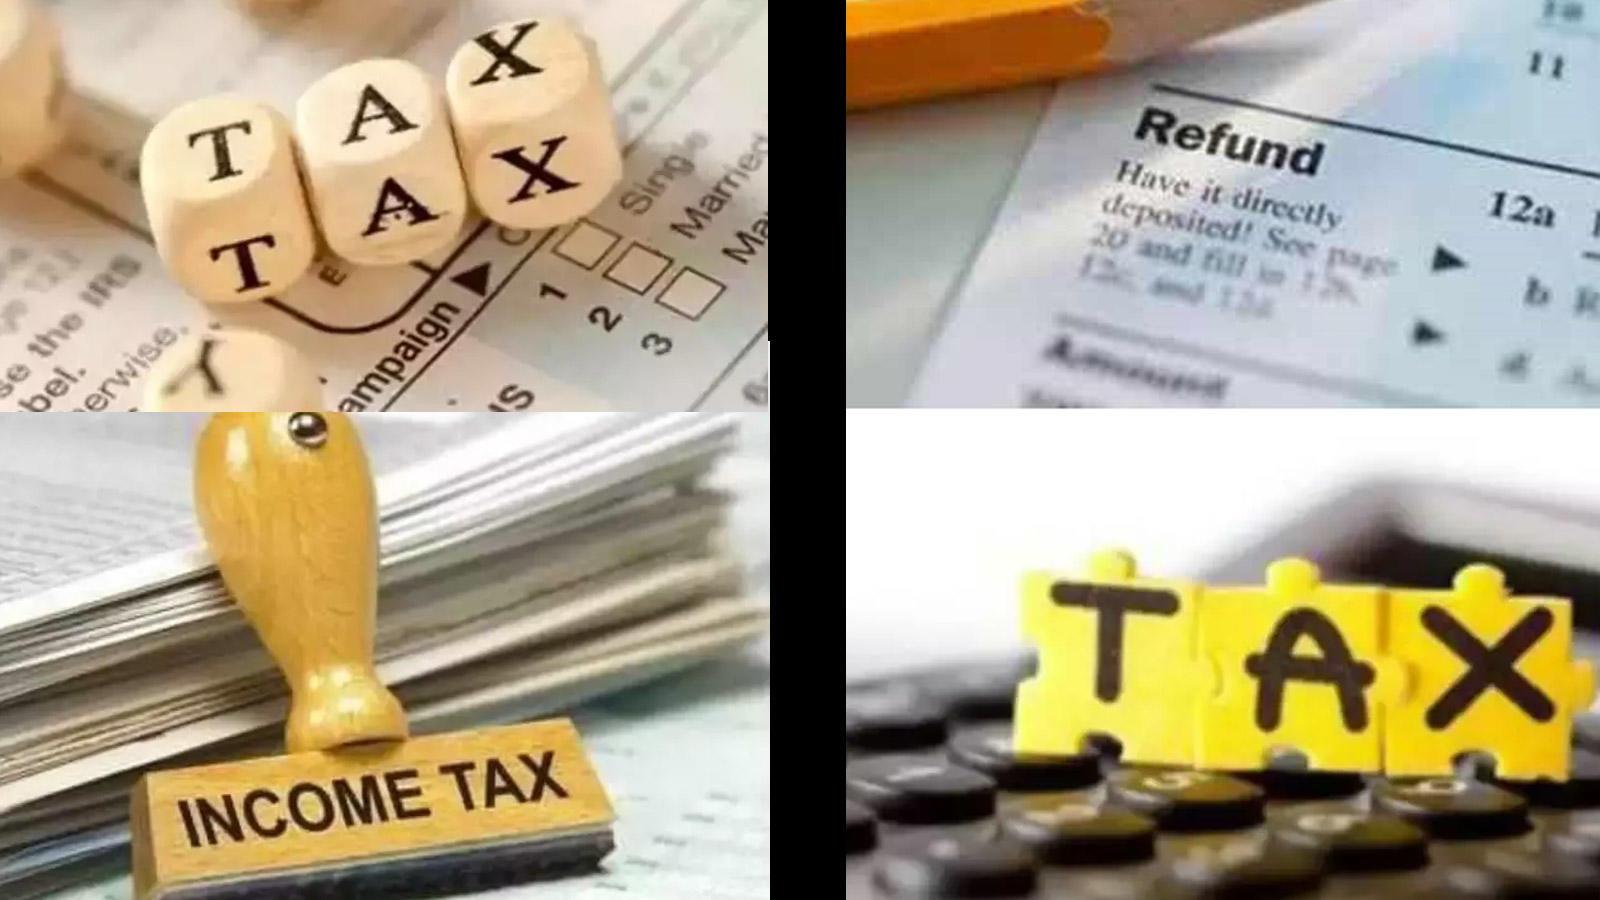 income-tax-return-filing-deadline-for-fy-20-extended-to-november-30-2020